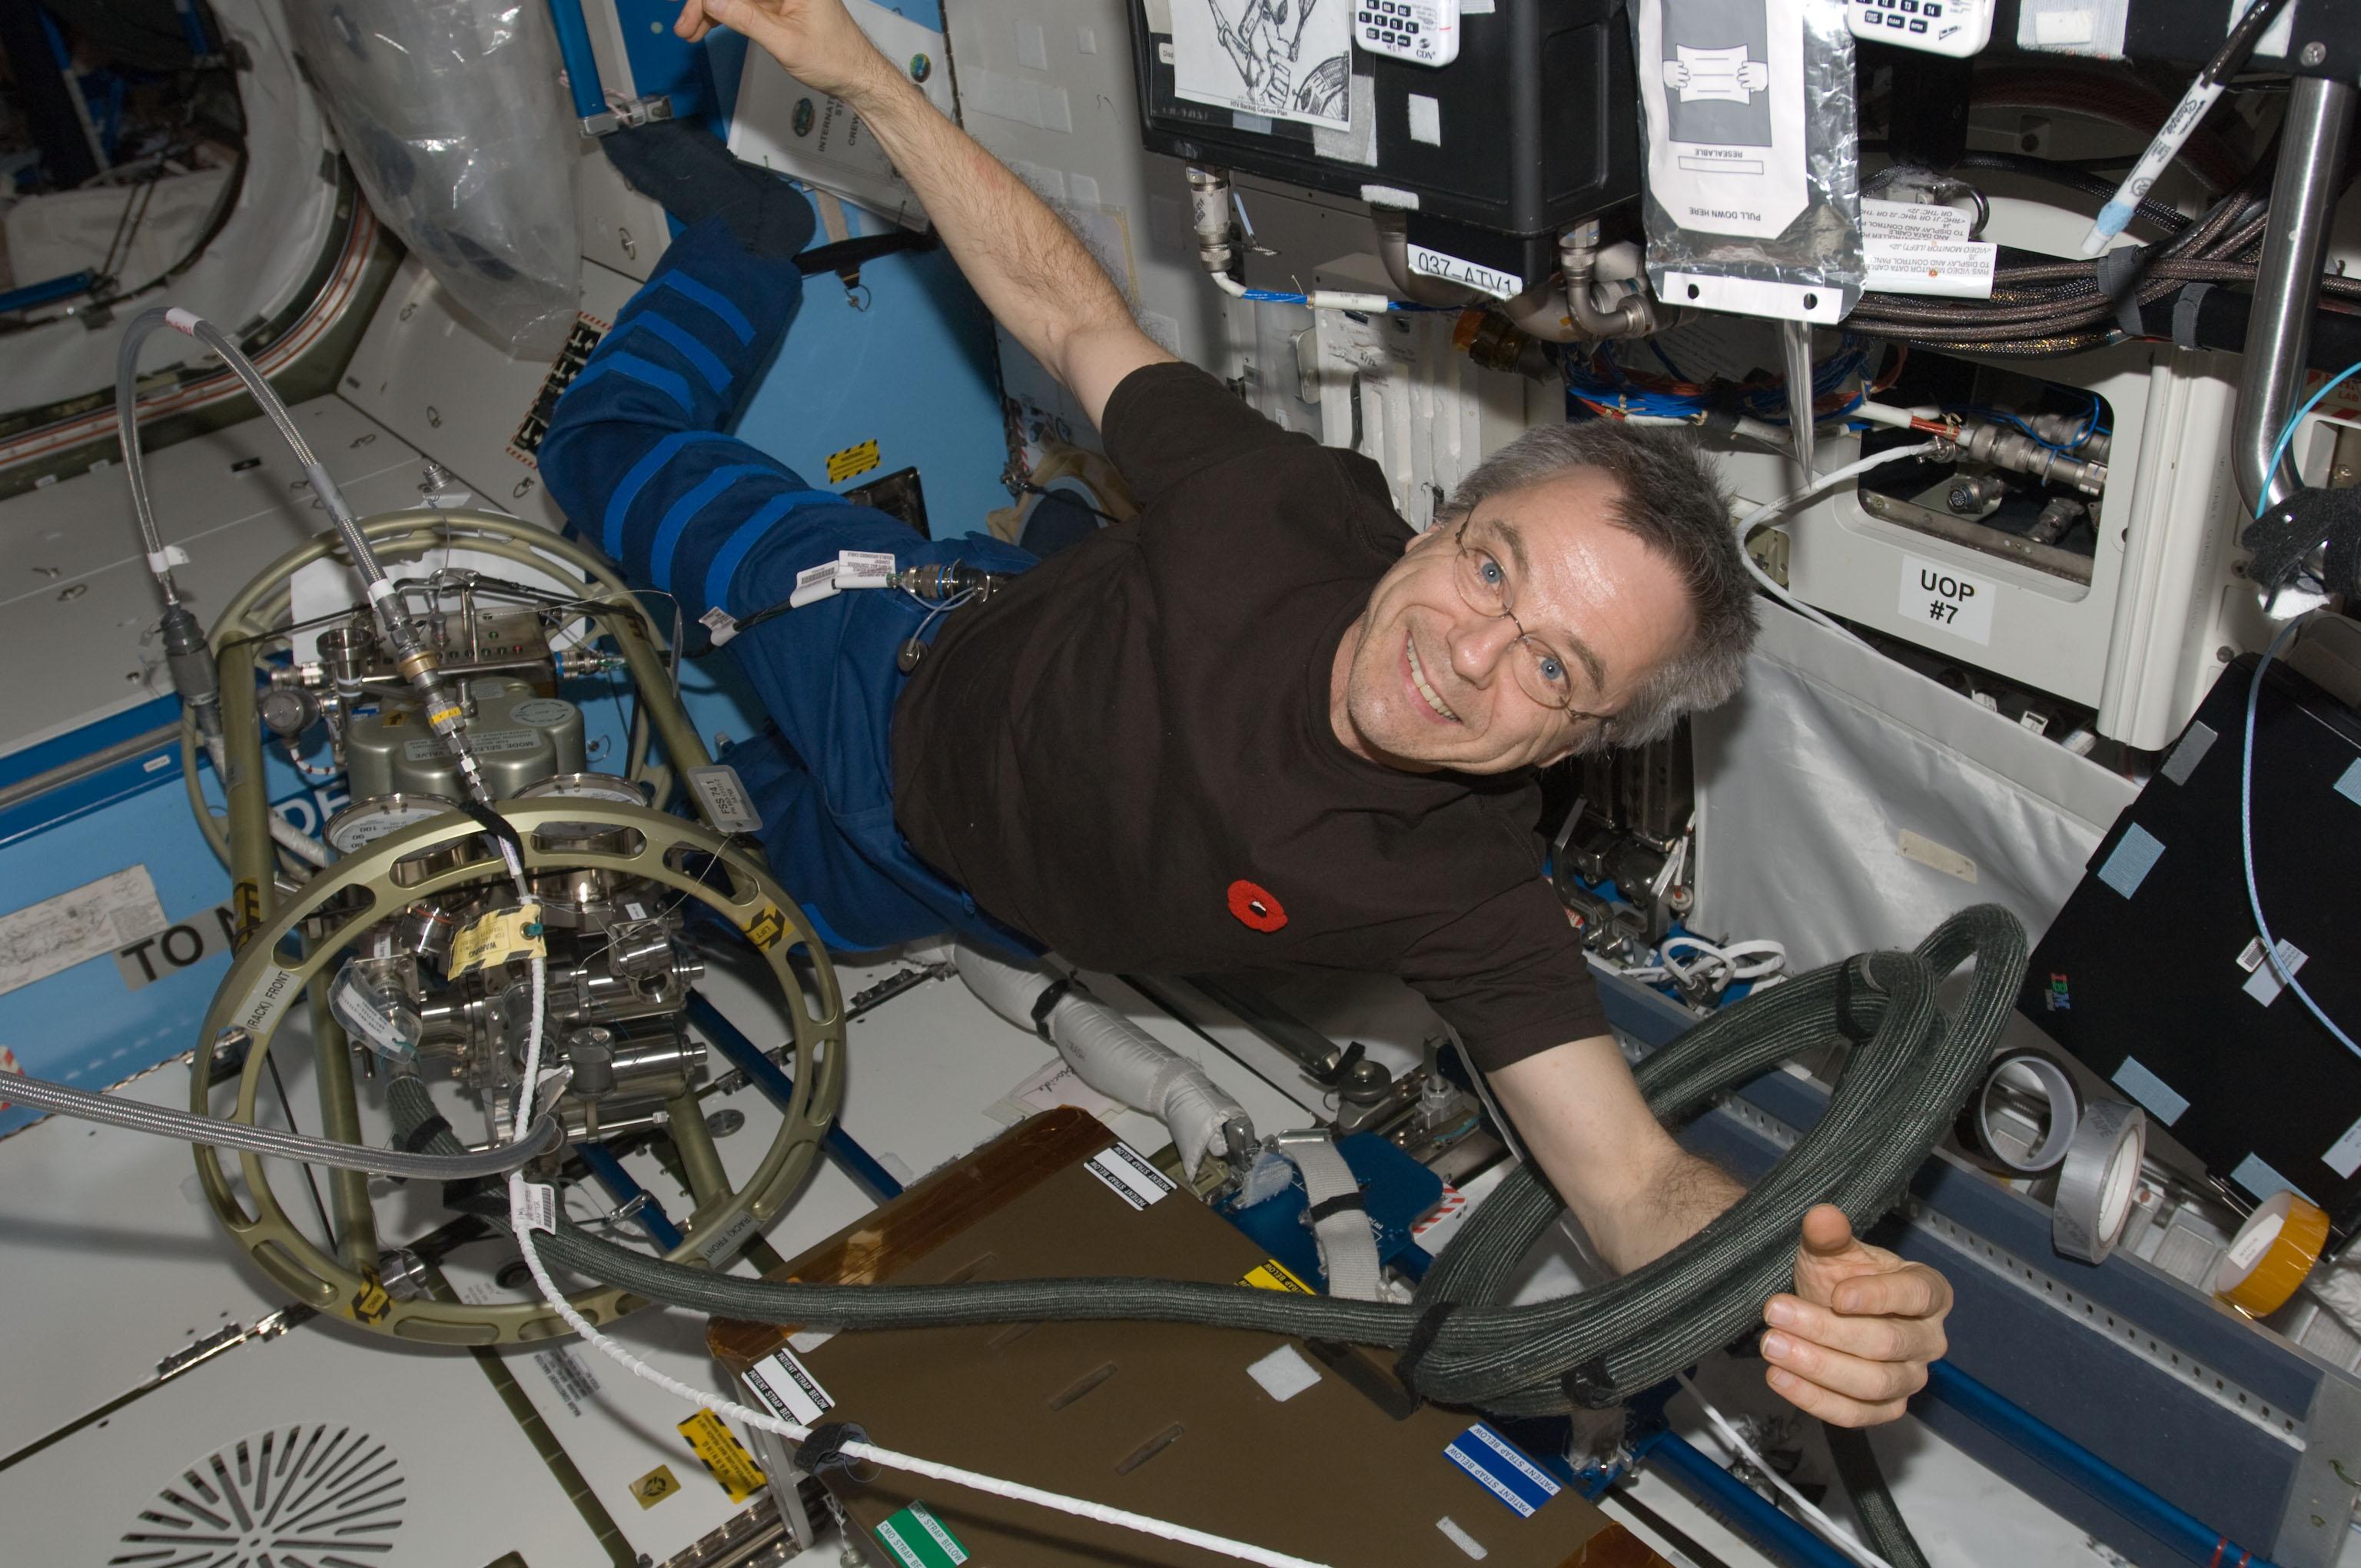 canadian astronaut international space station - photo #20